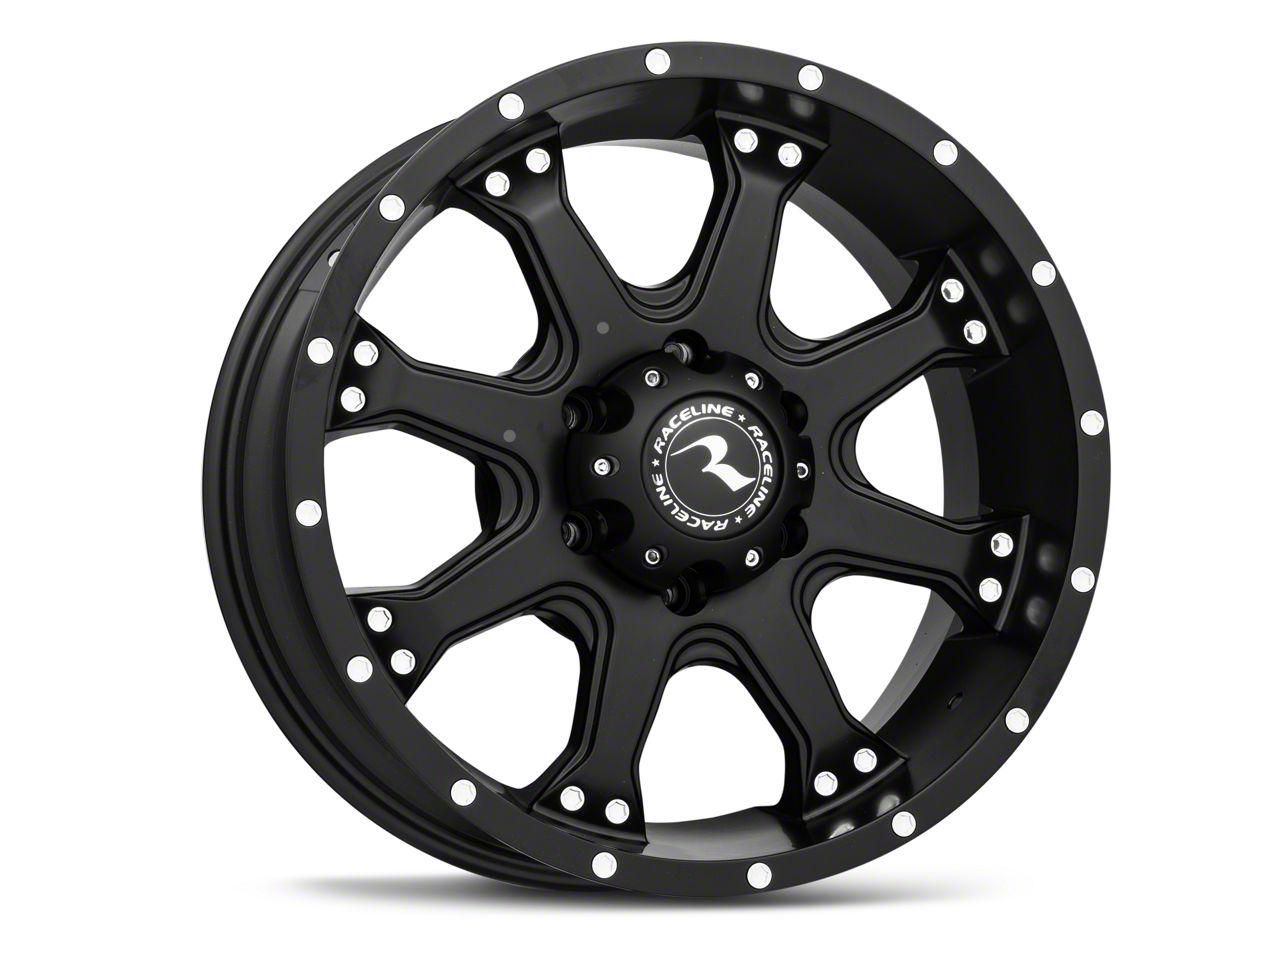 Raceline Injector Black 6-Lug Wheel - 20x9 (99-18 Silverado 1500)